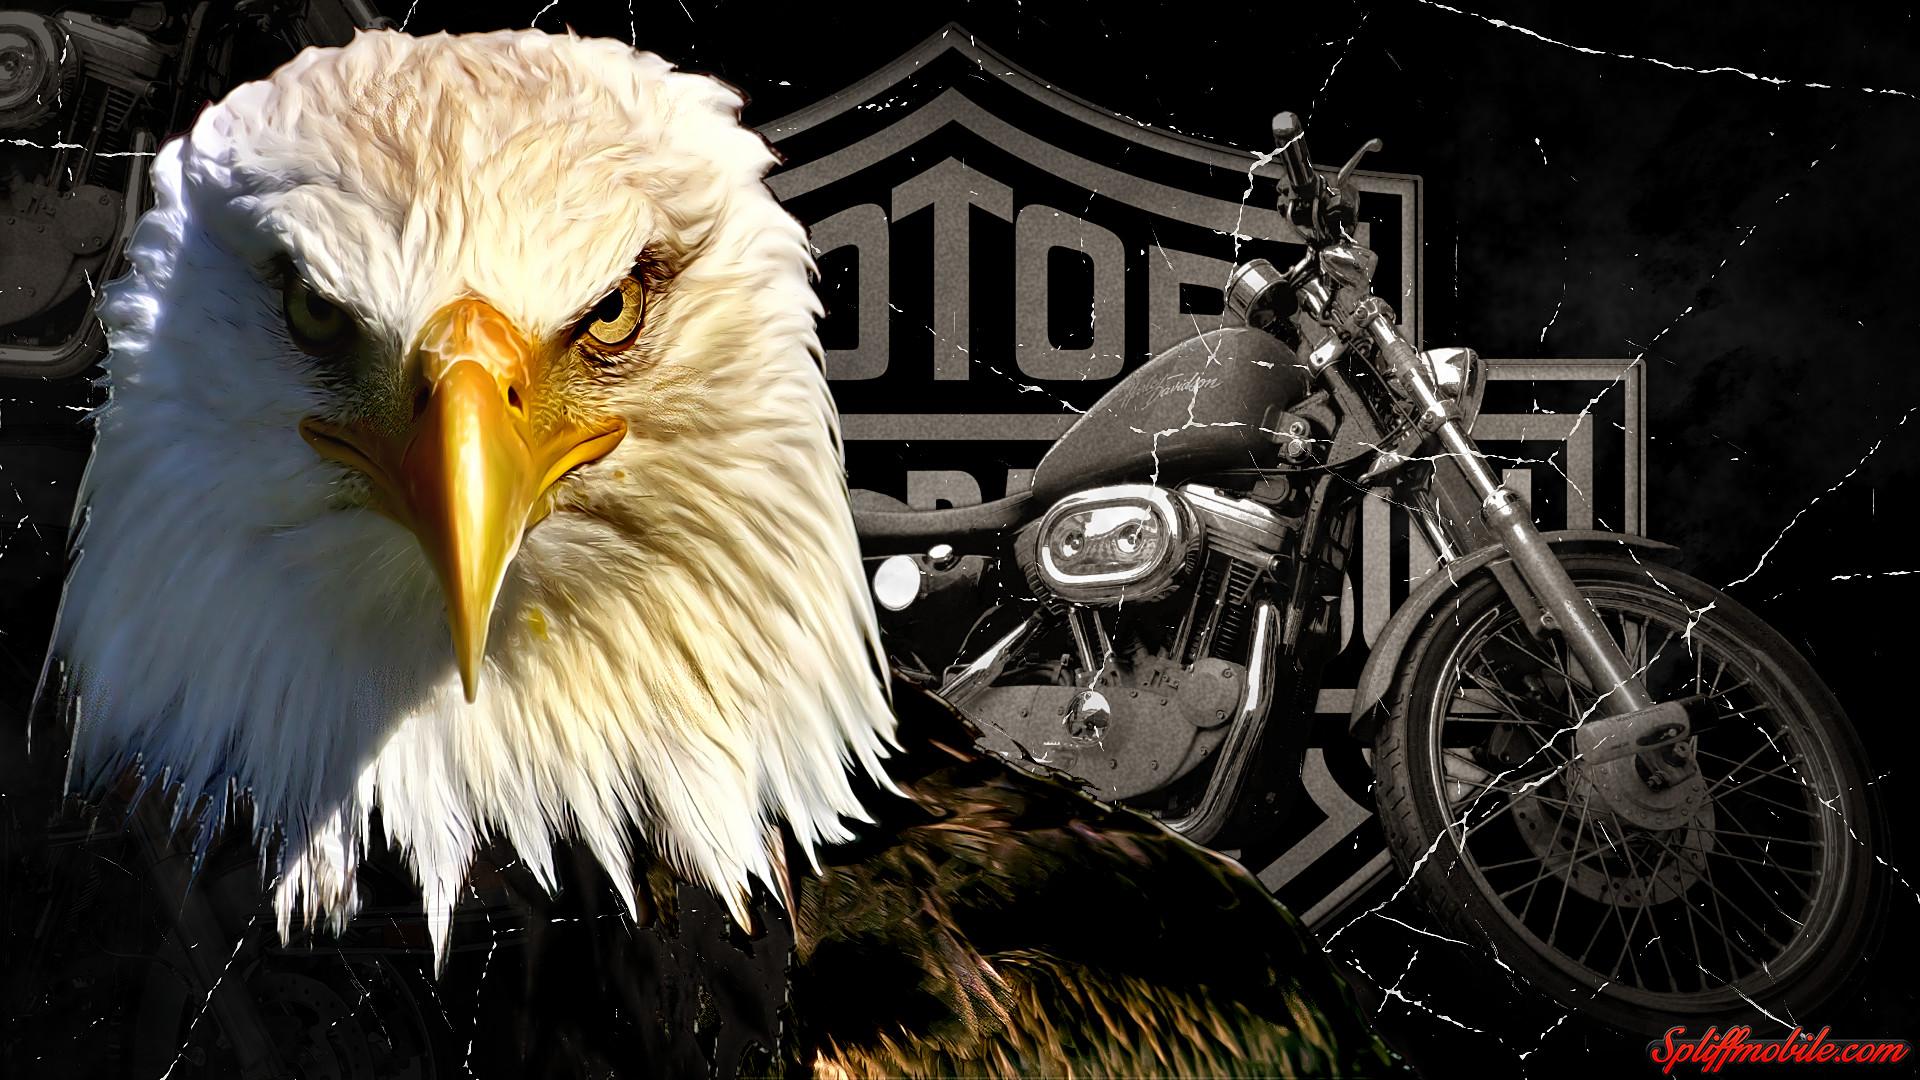 Imagenes De Motos Harley: Harley Davidson Wallpapers And Screensavers (80+ Images